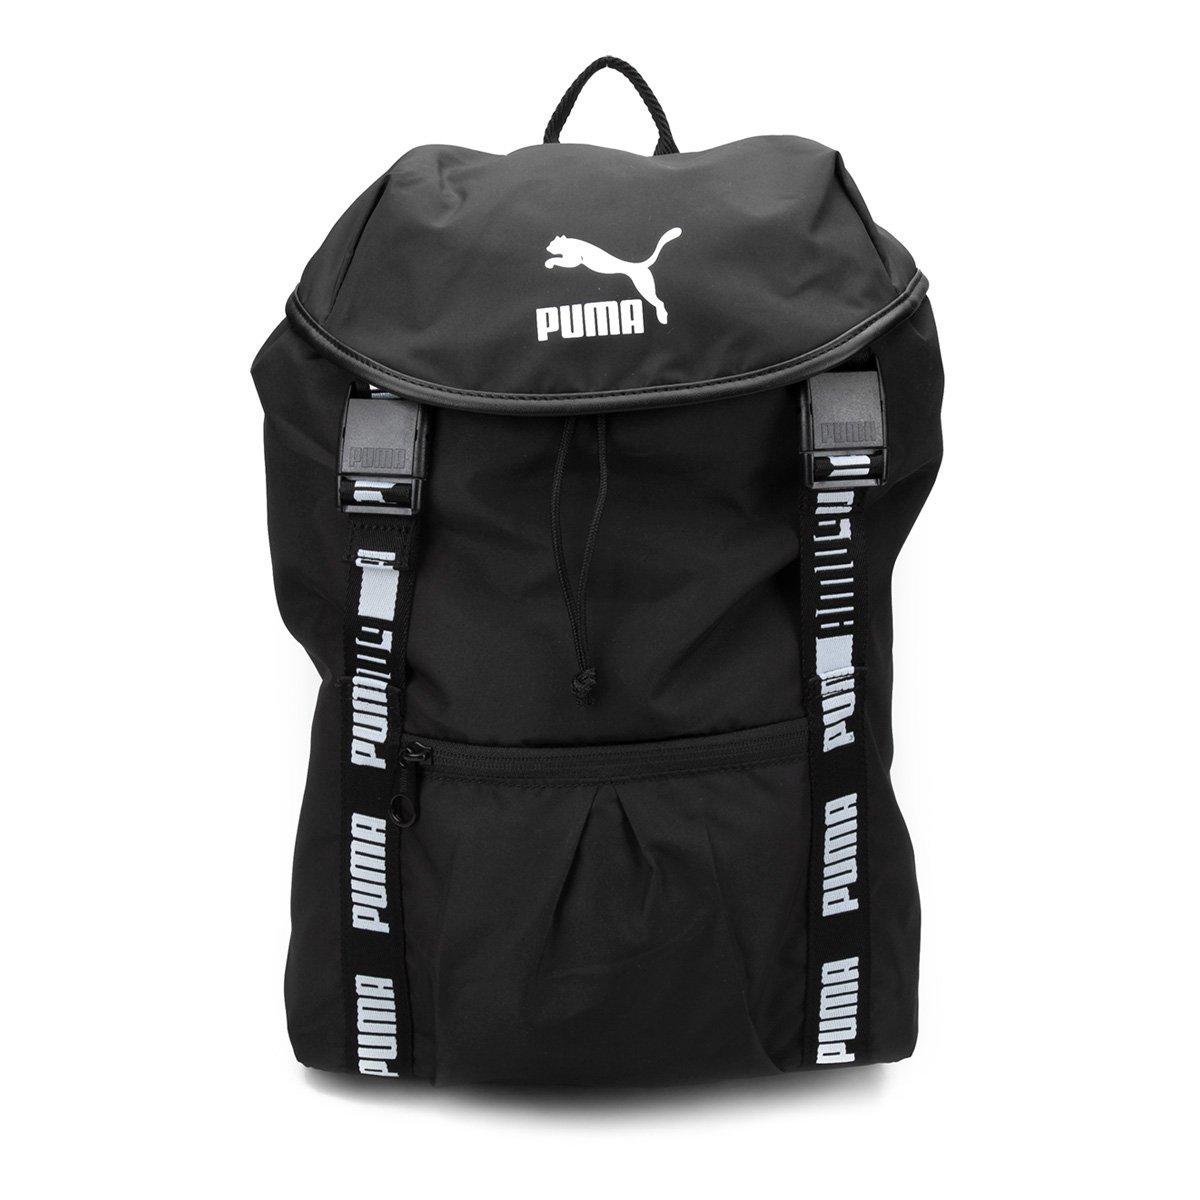 5c05b34f0 Mochila Puma Prime Lux Backpack Feminina | Netshoes